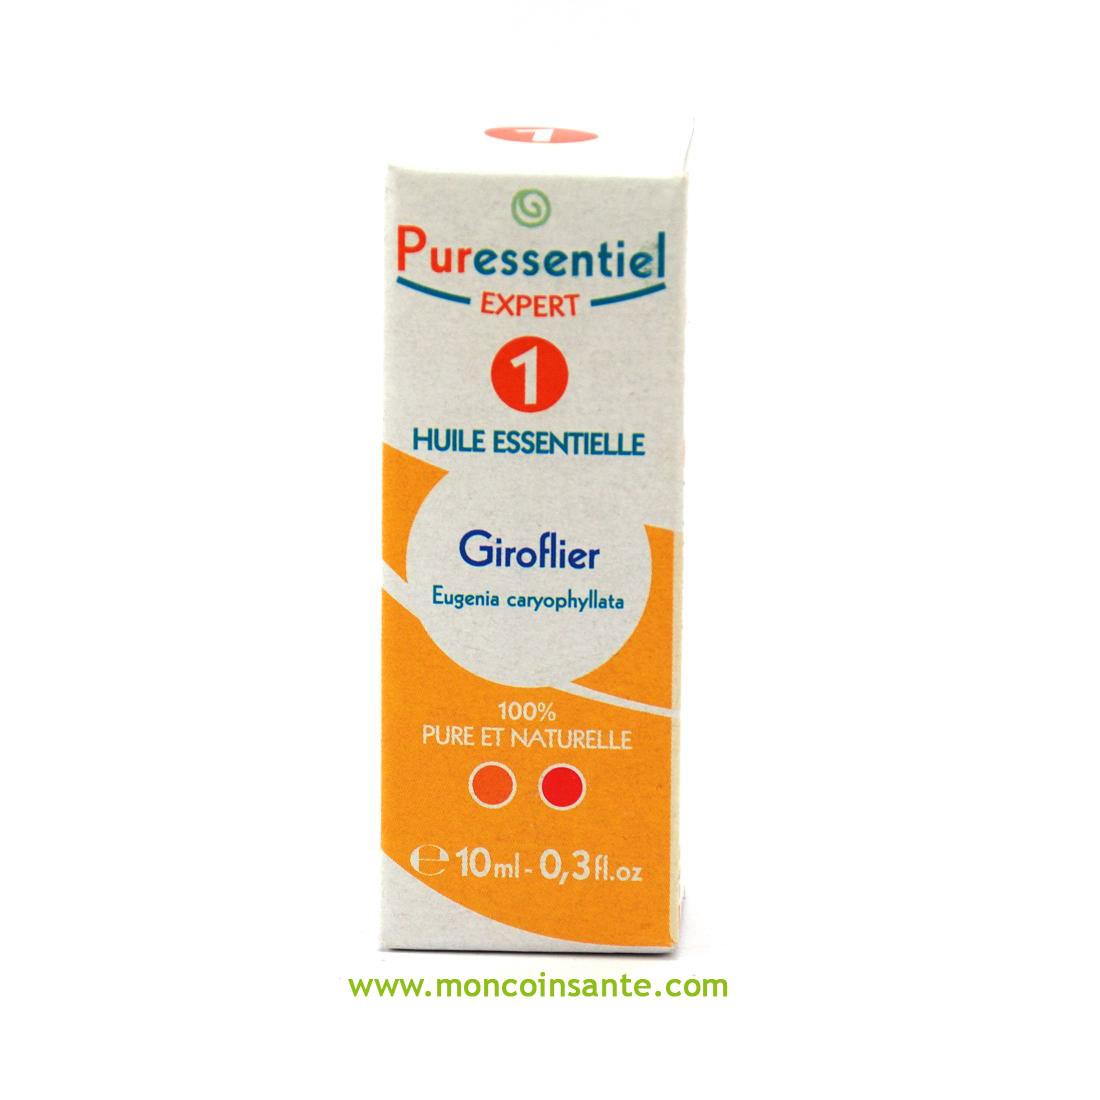 Puressentiel huile essentielle gaulthrie 10ml catgorie coupe faim - Huile essentielle pamplemousse coupe faim ...